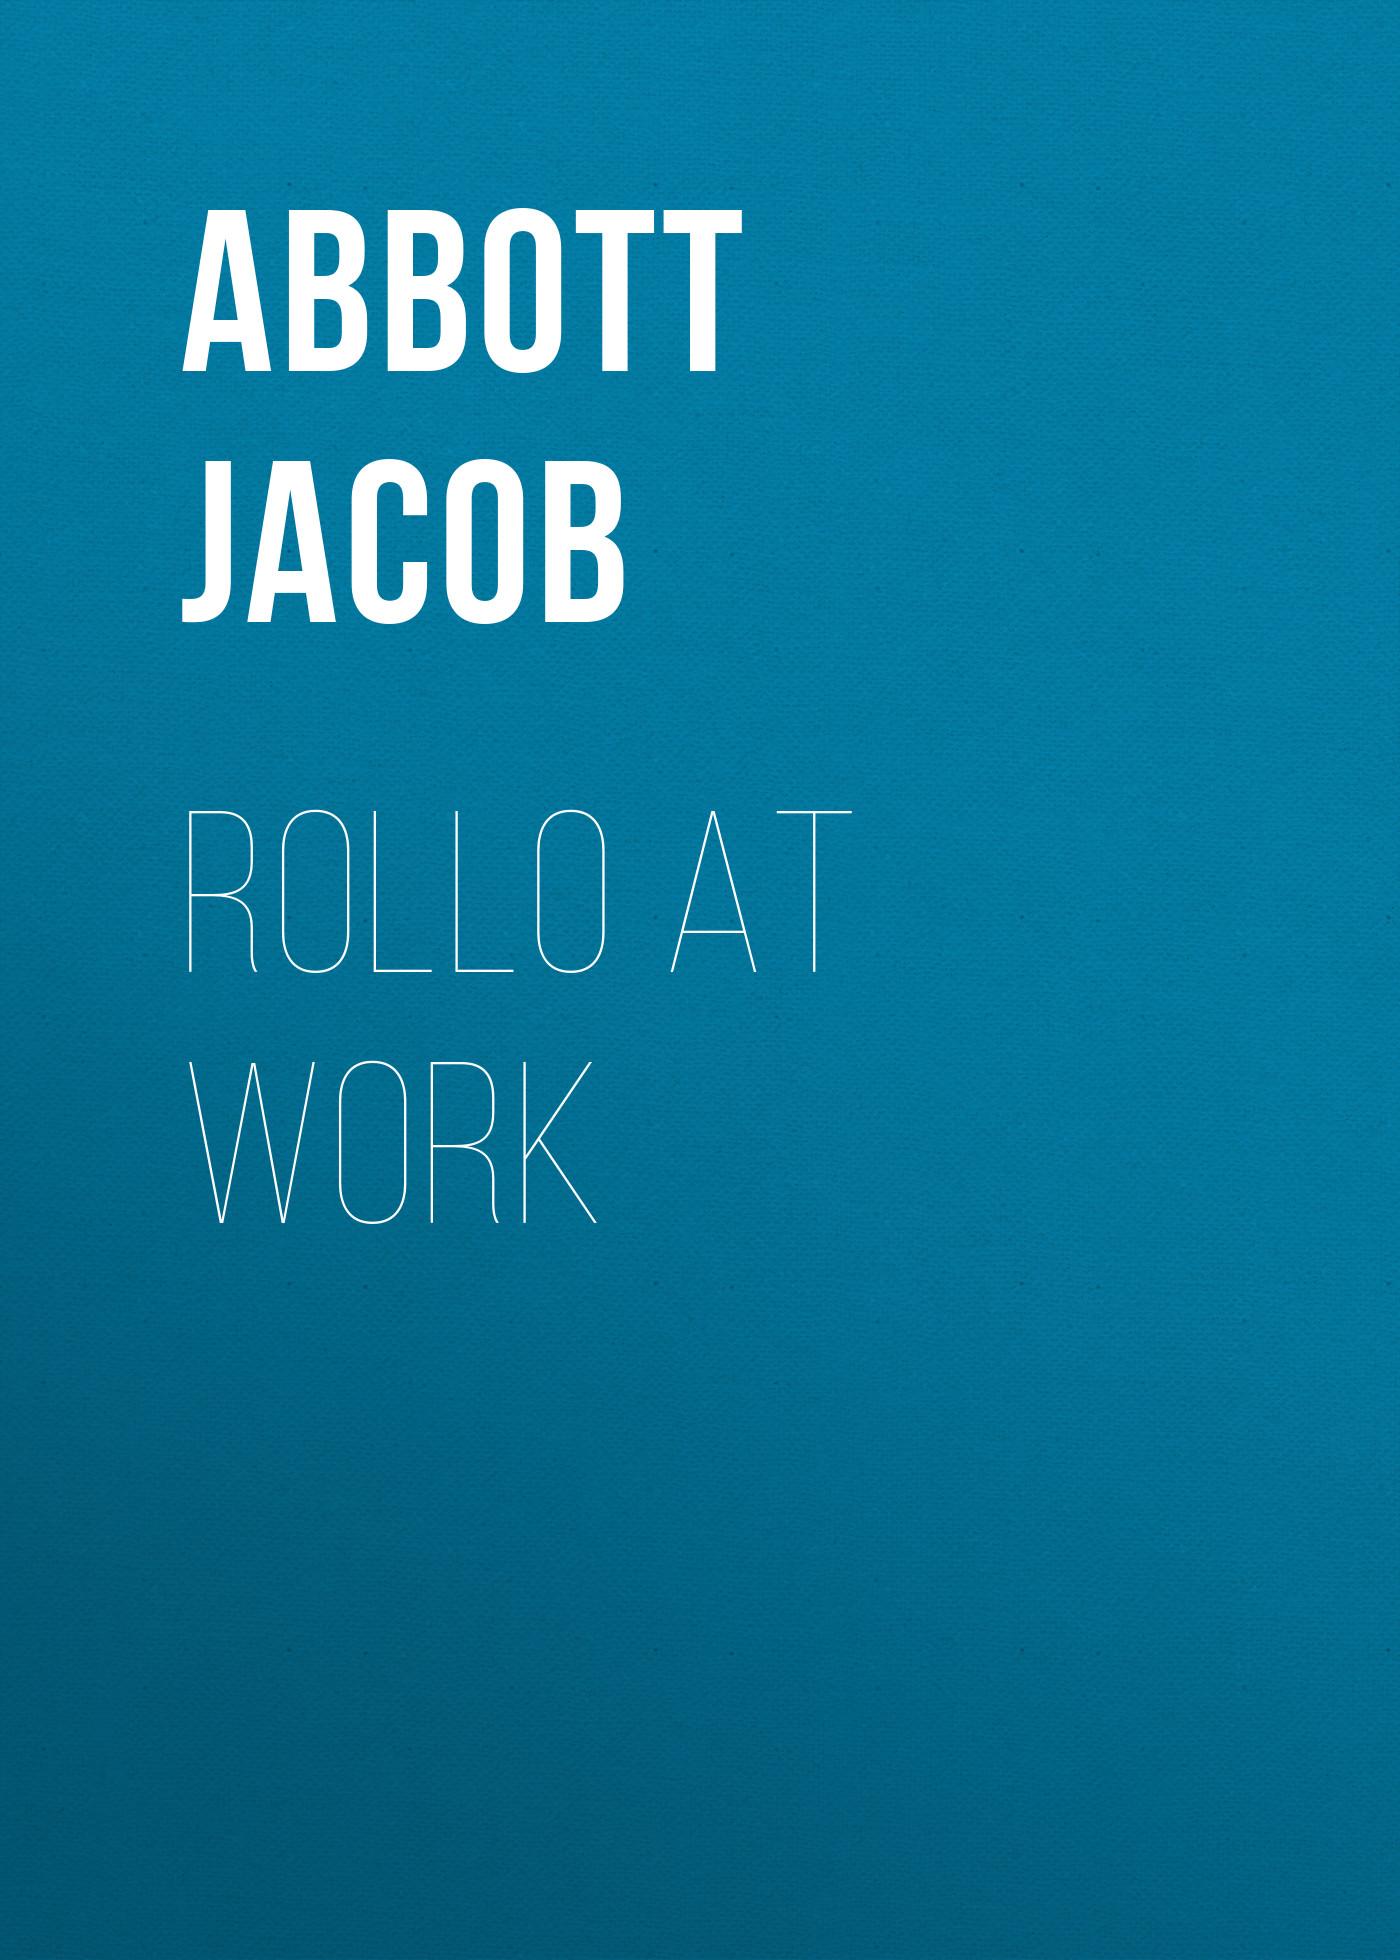 Abbott Jacob Rollo at Work